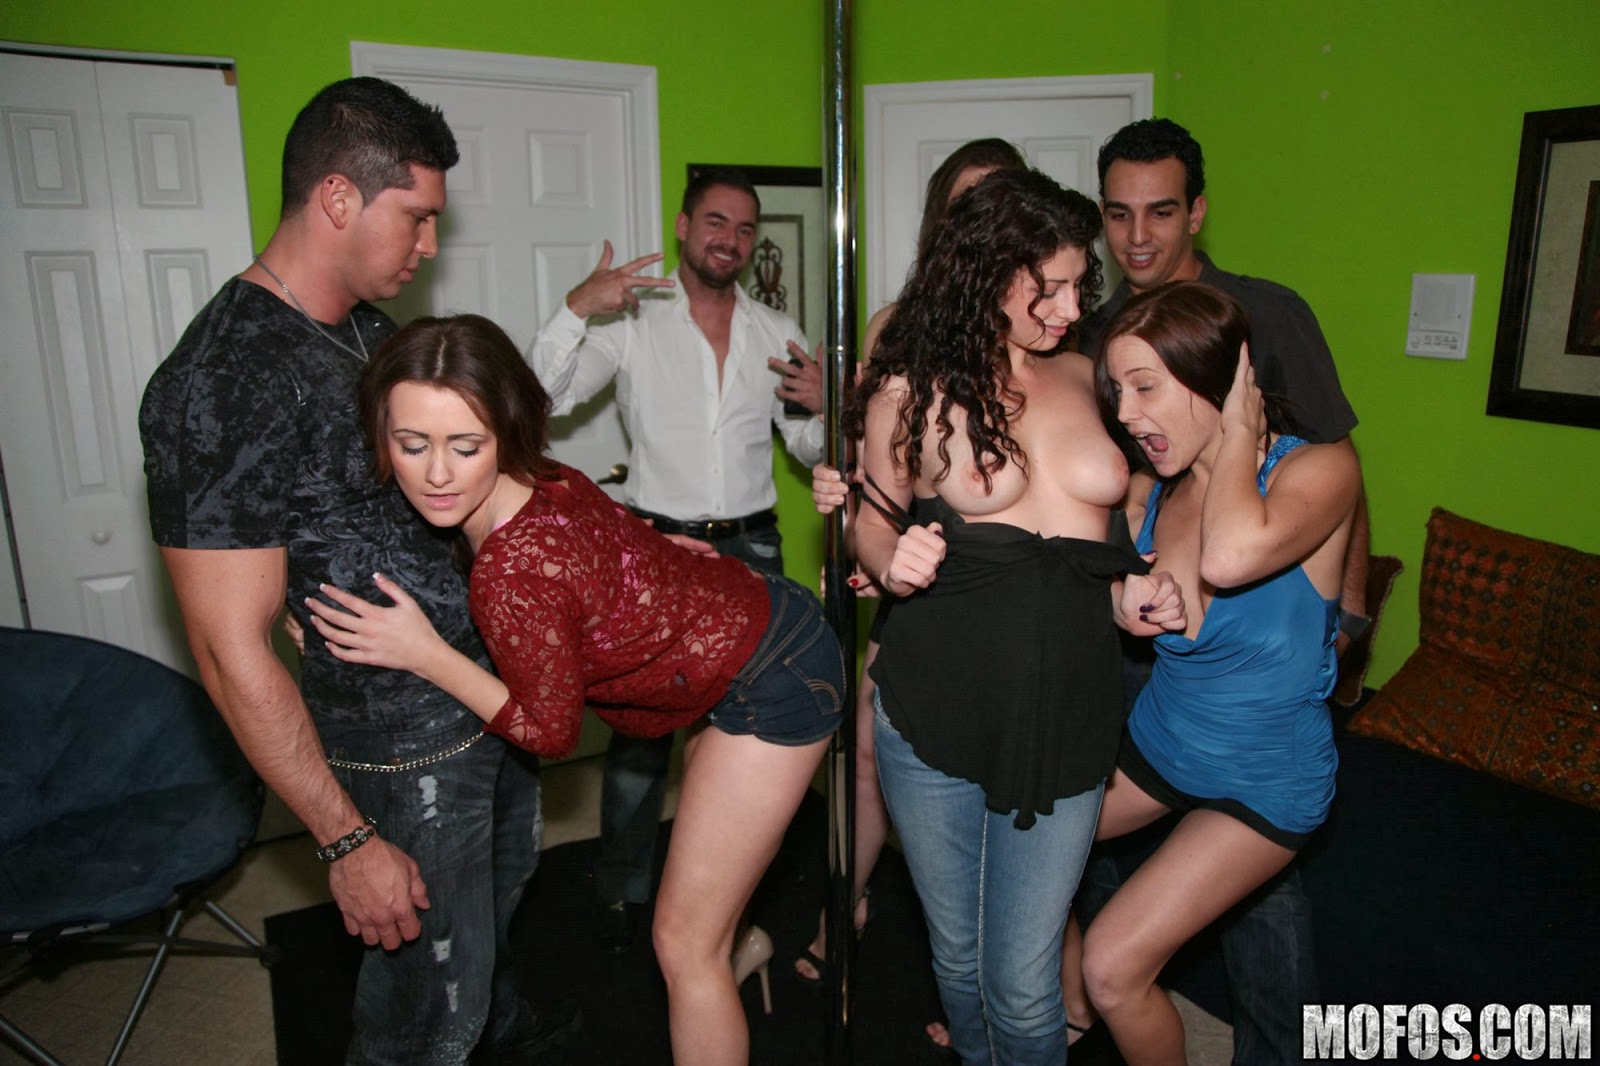 Real slut party allee mack kenna kane victoria lawson - 1 part 9